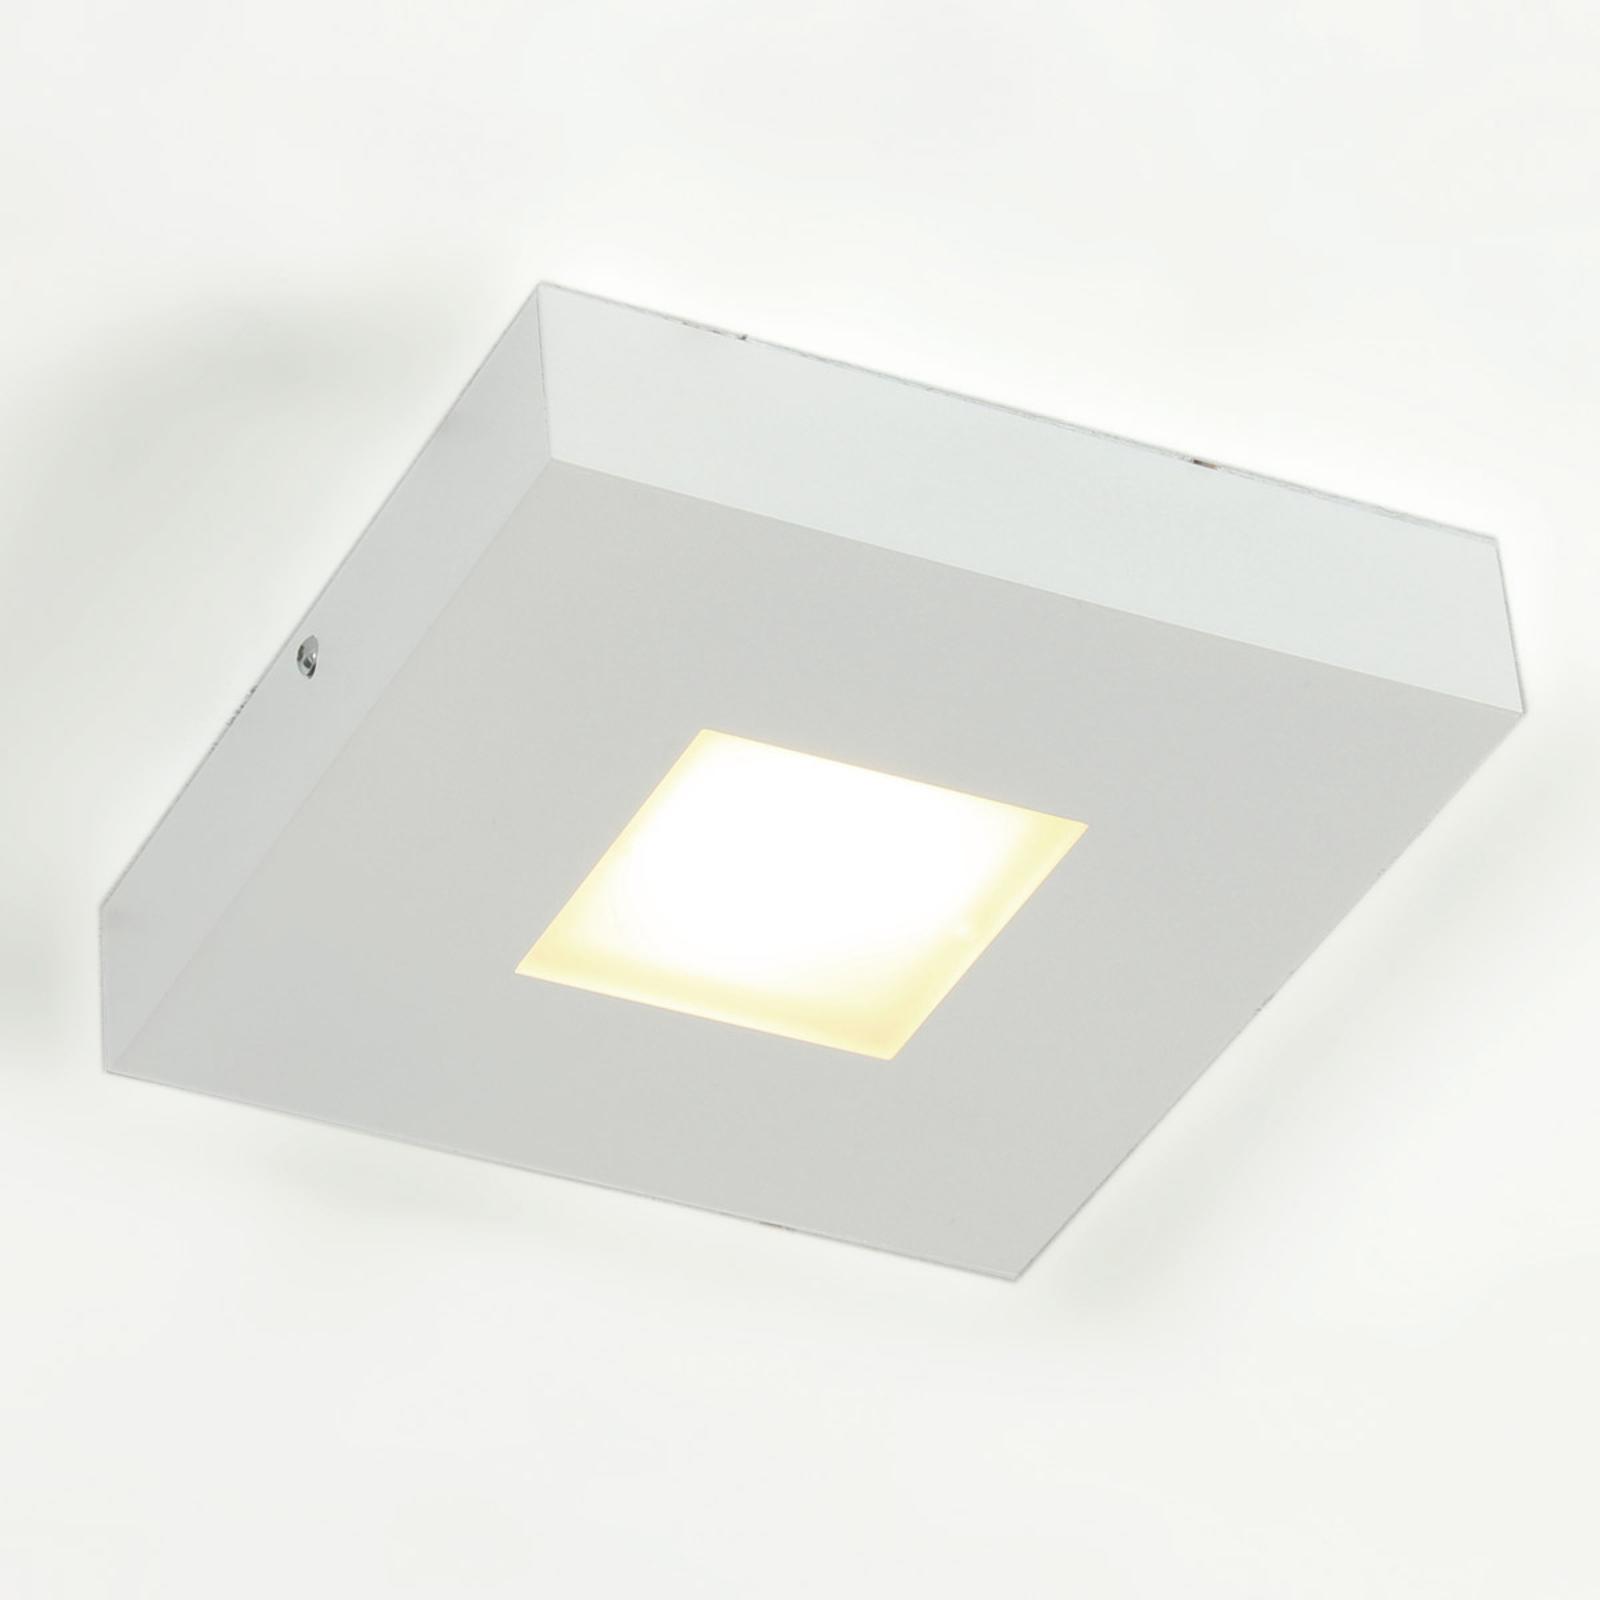 Førsteklasses LED-loftslampe Cubus, hvid